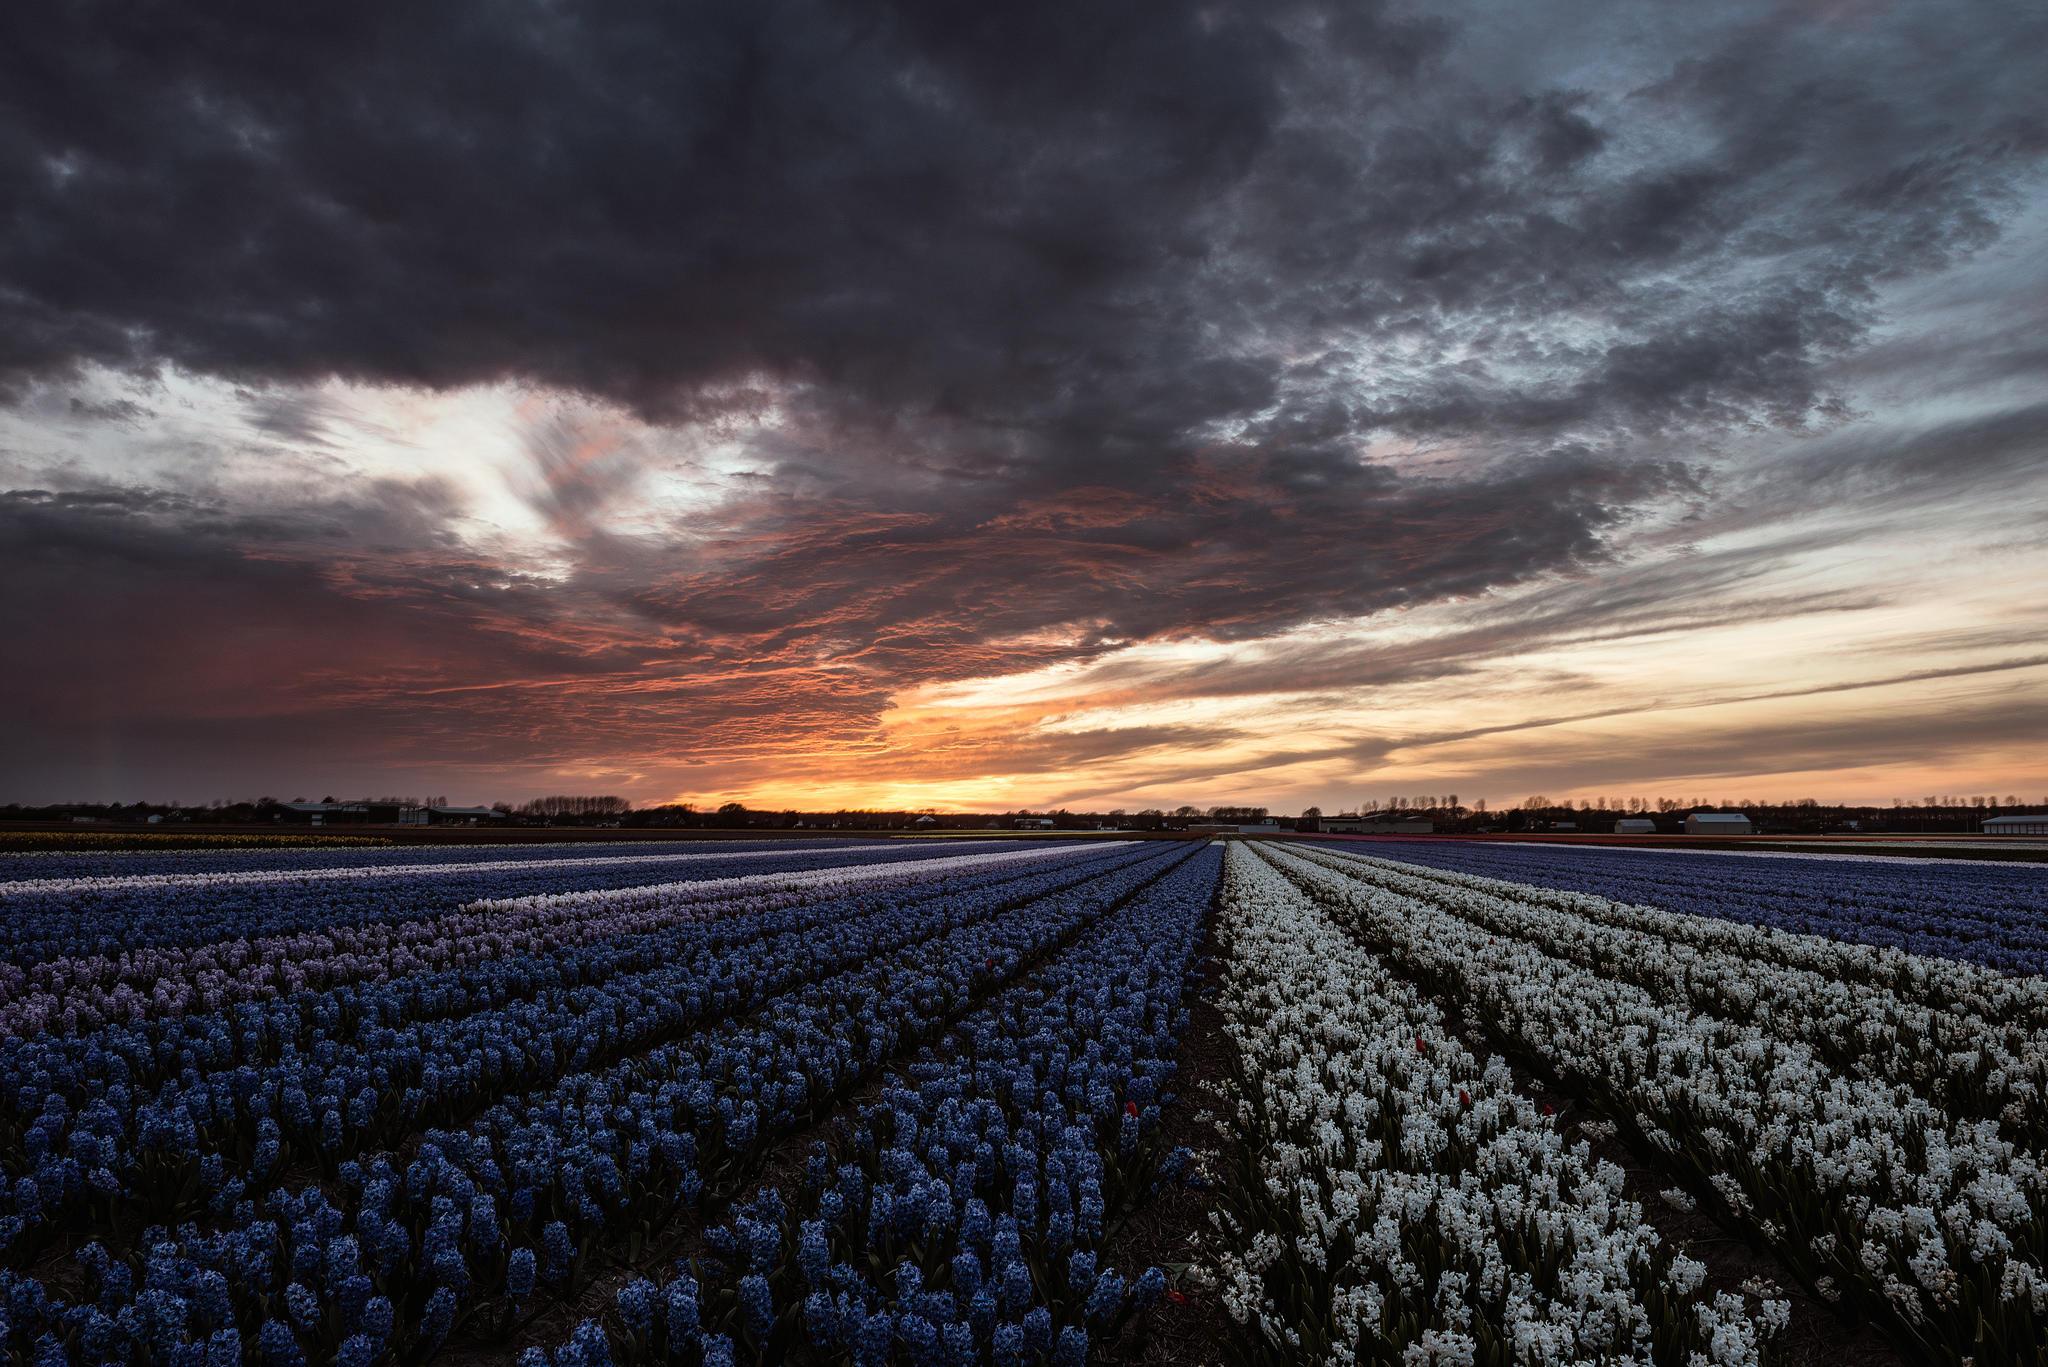 обои Lisse-Netherlands, Лиссе, Нидерланды закат, поля картинки фото